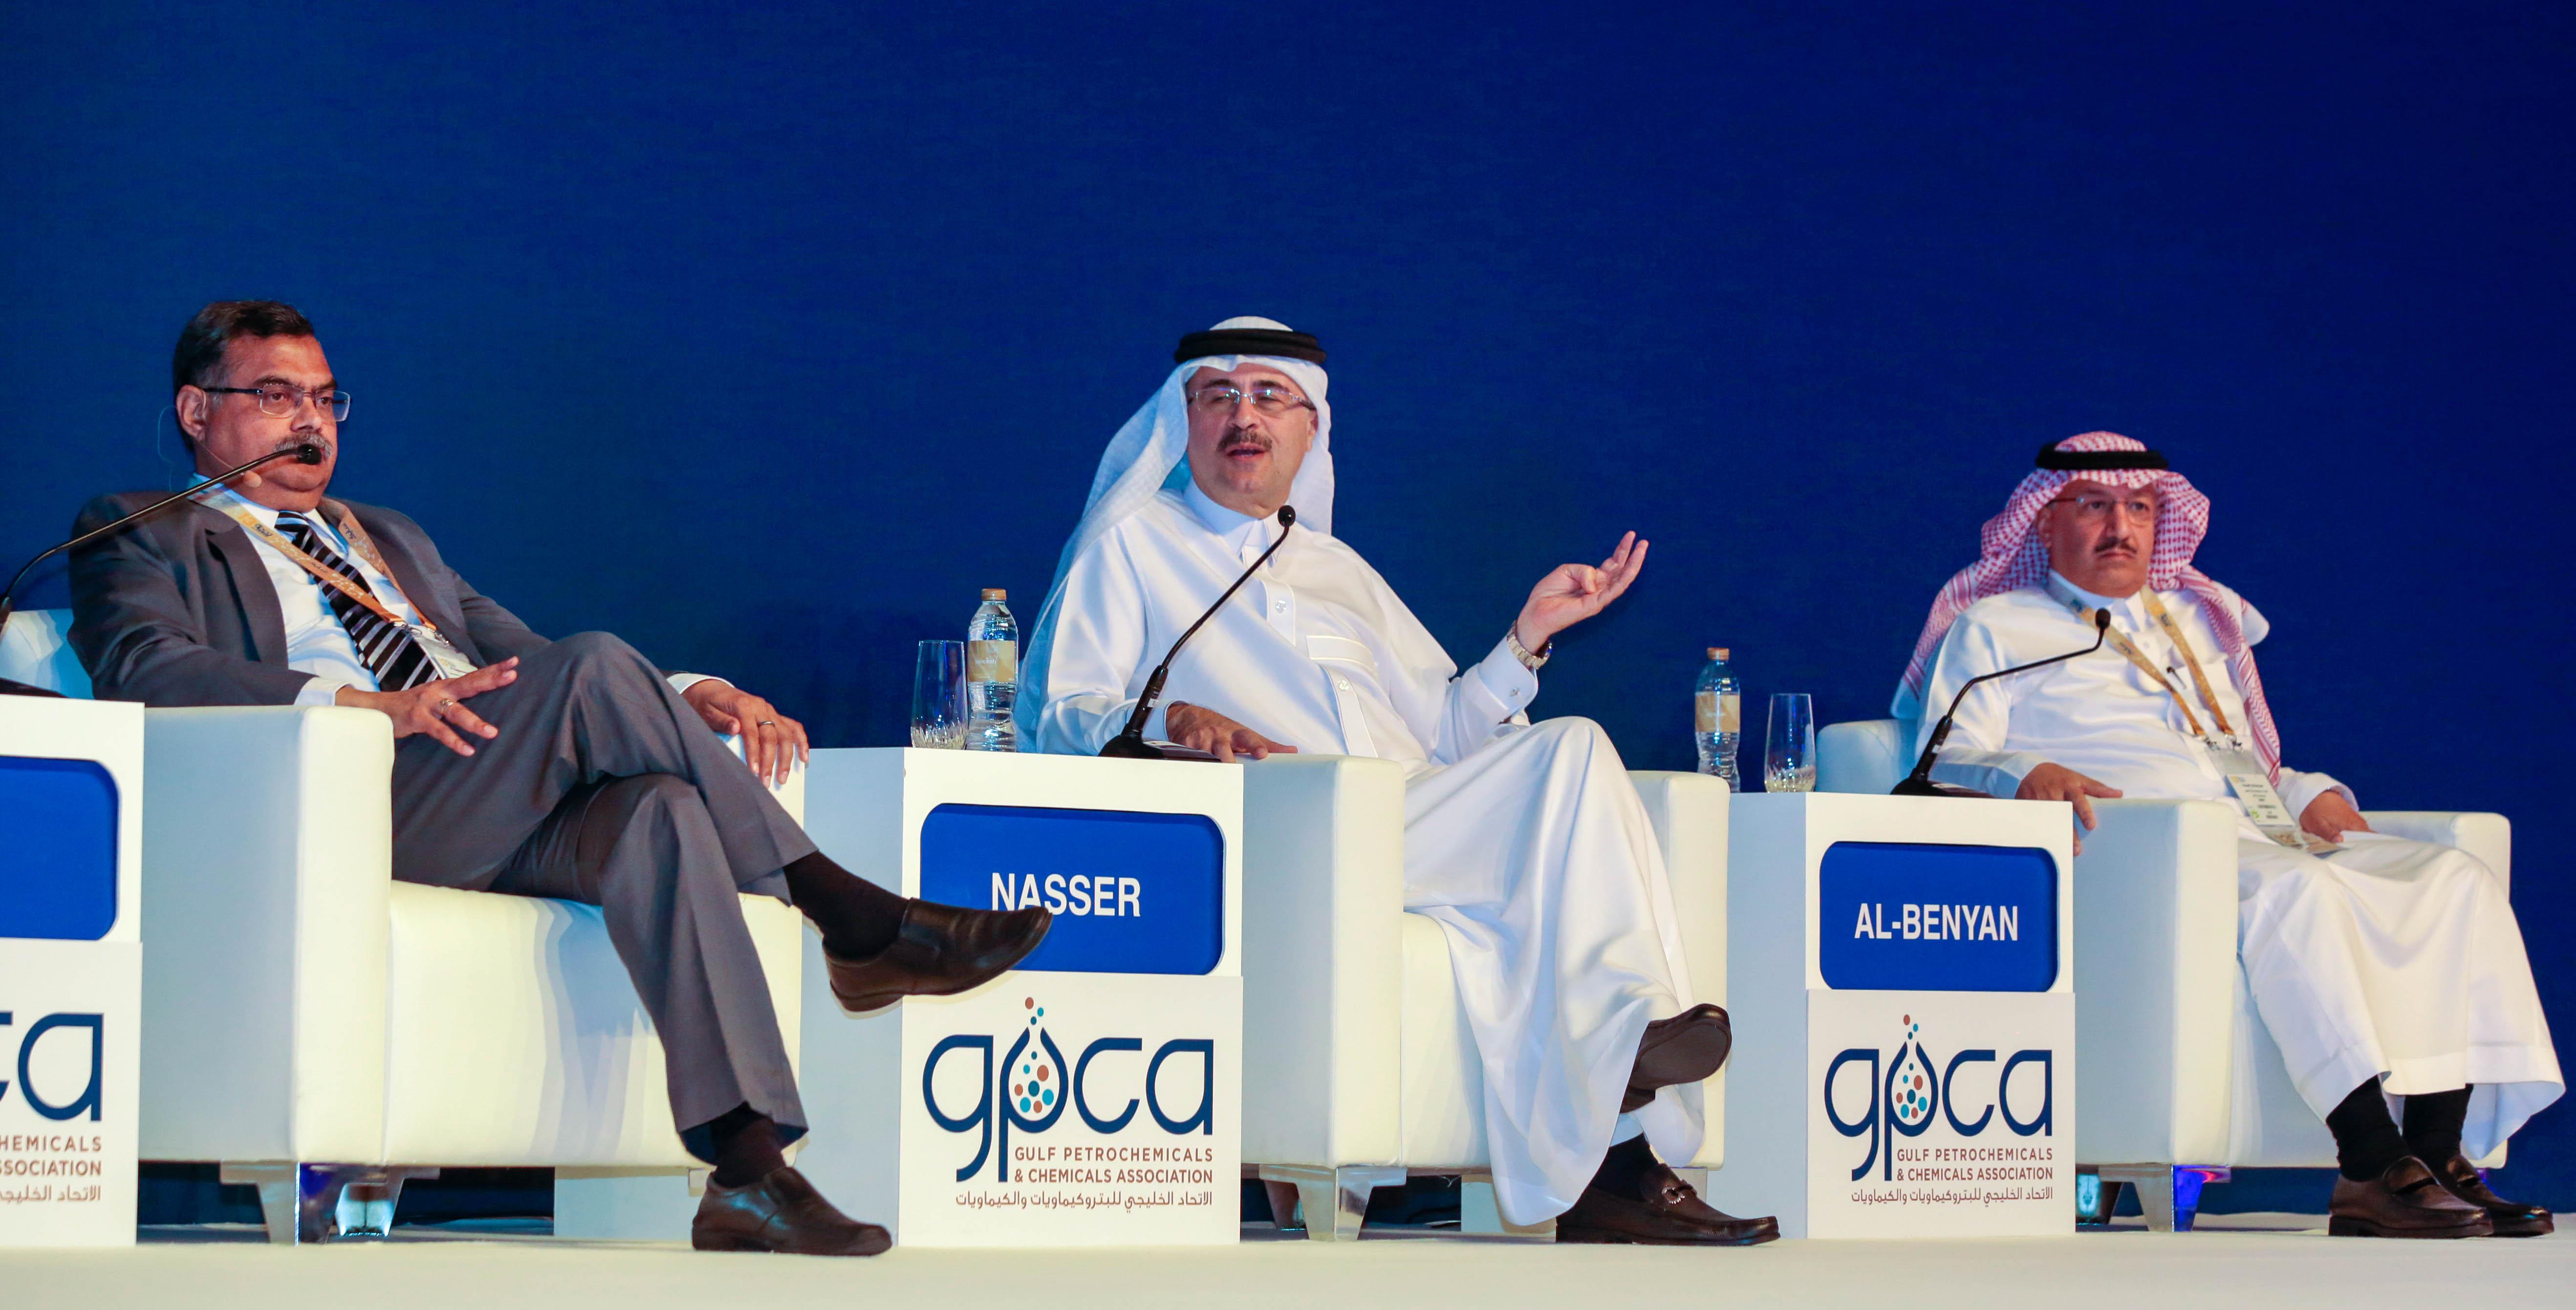 Driving diversification and transformation - GPCA